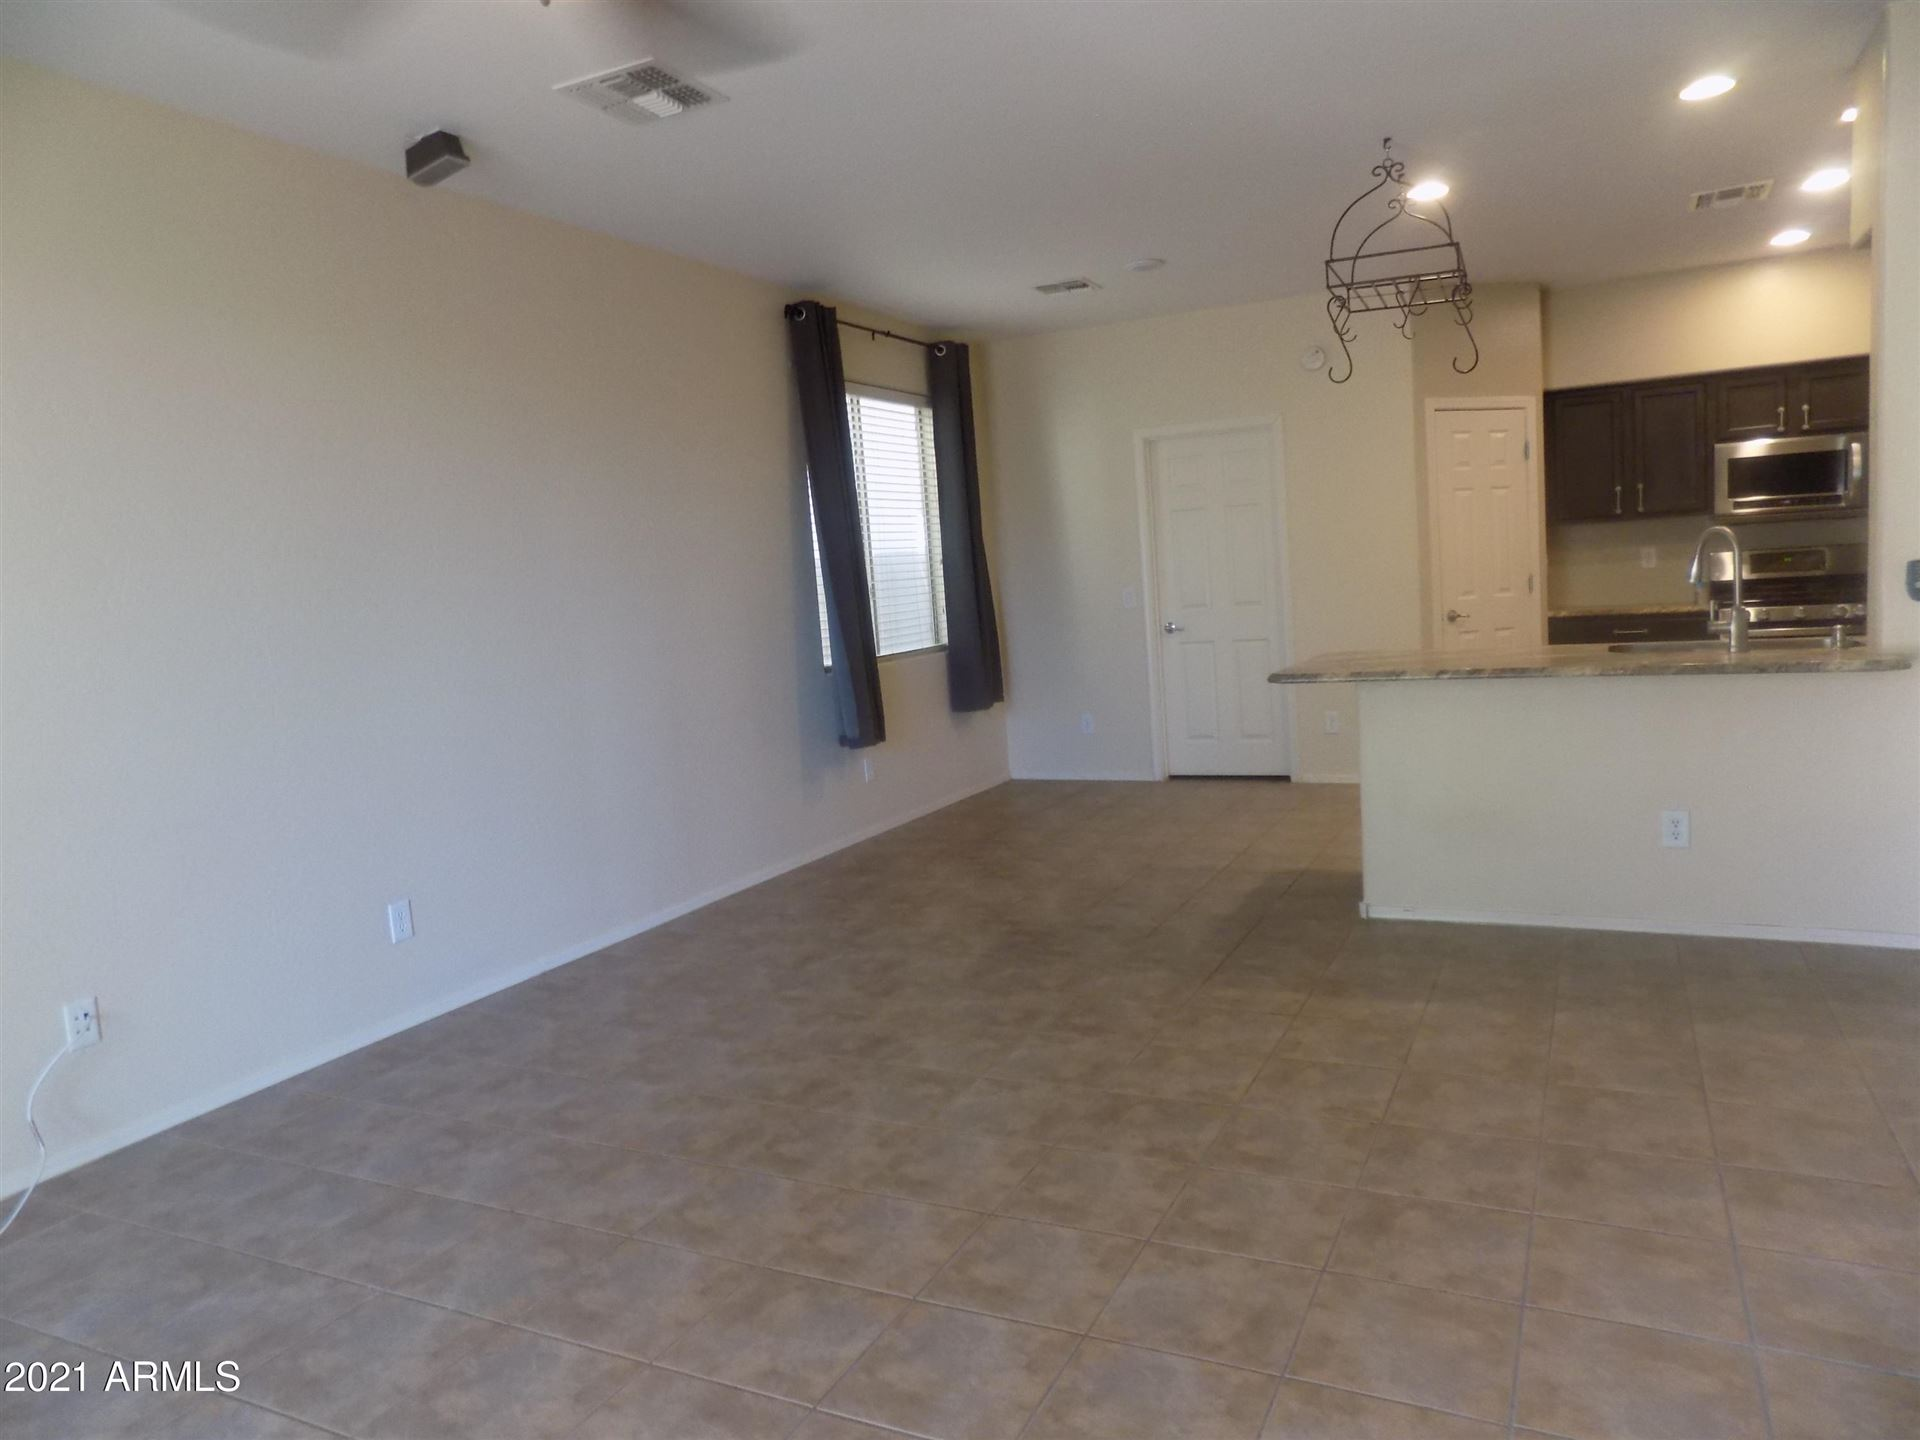 Photo of 4419 W POWELL Drive, New River, AZ 85087 (MLS # 6242503)